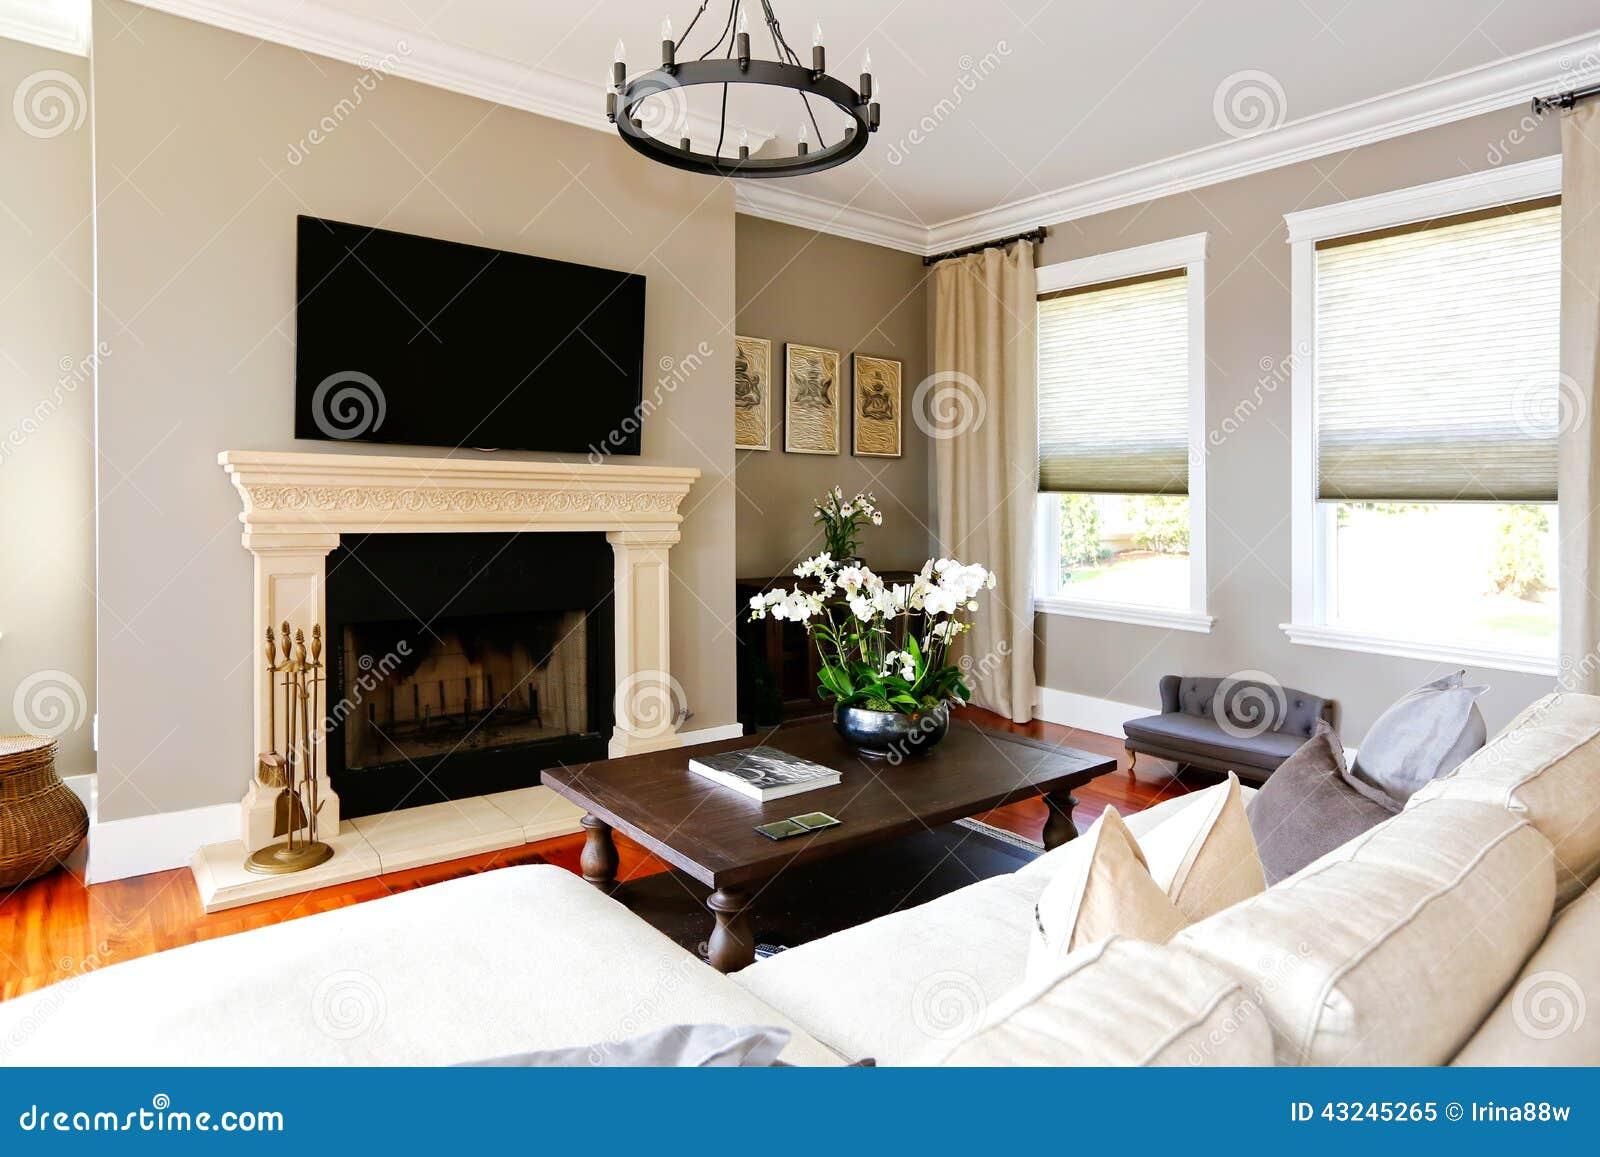 Openhaard In Woonkamer : Openhaard in woonkamer. indeling woonkamer open haard a b g annelies